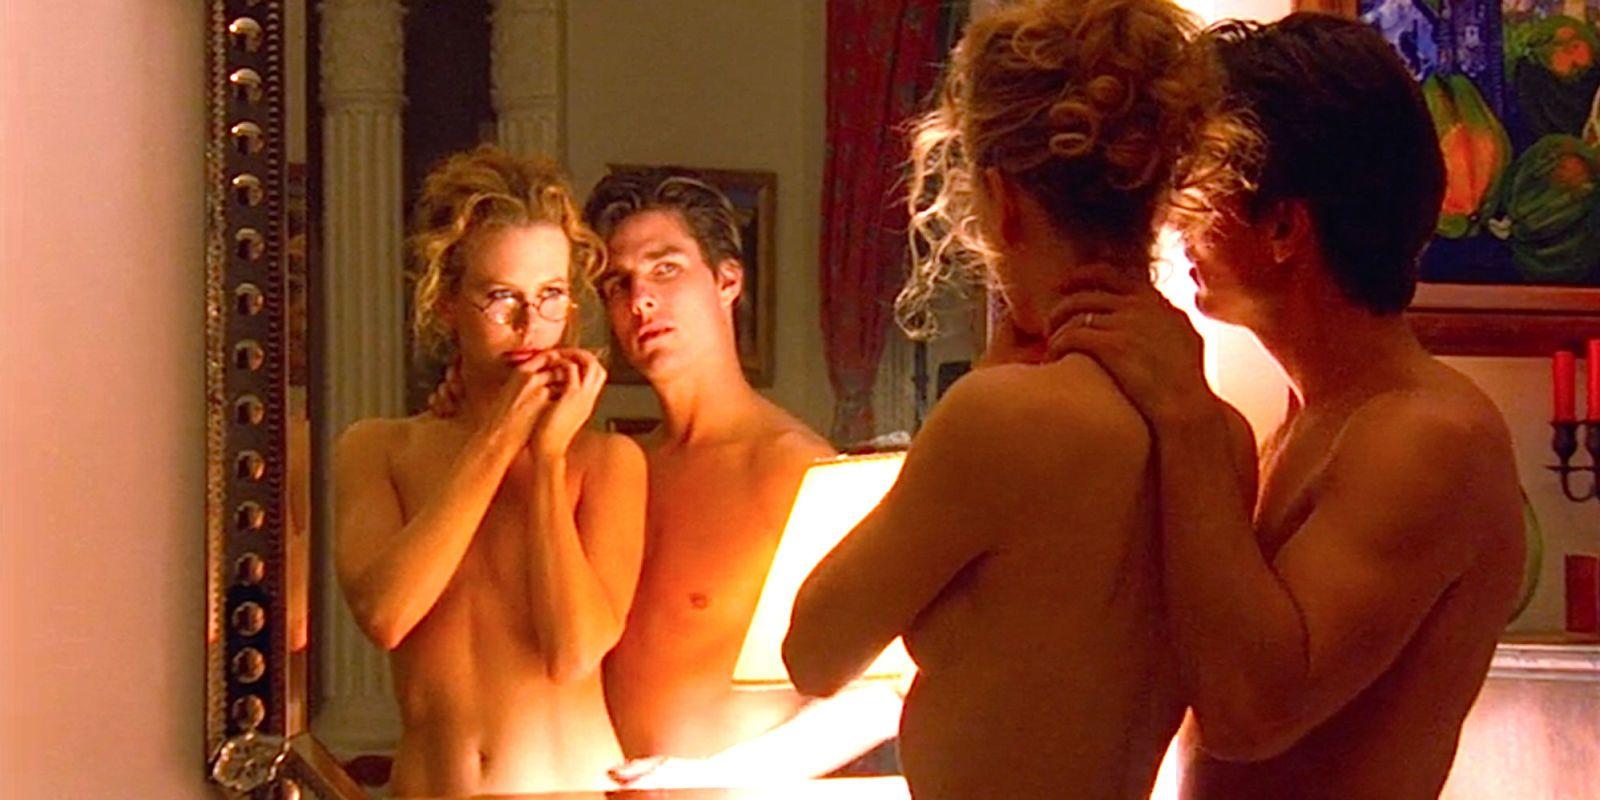 Best non sex nude scene